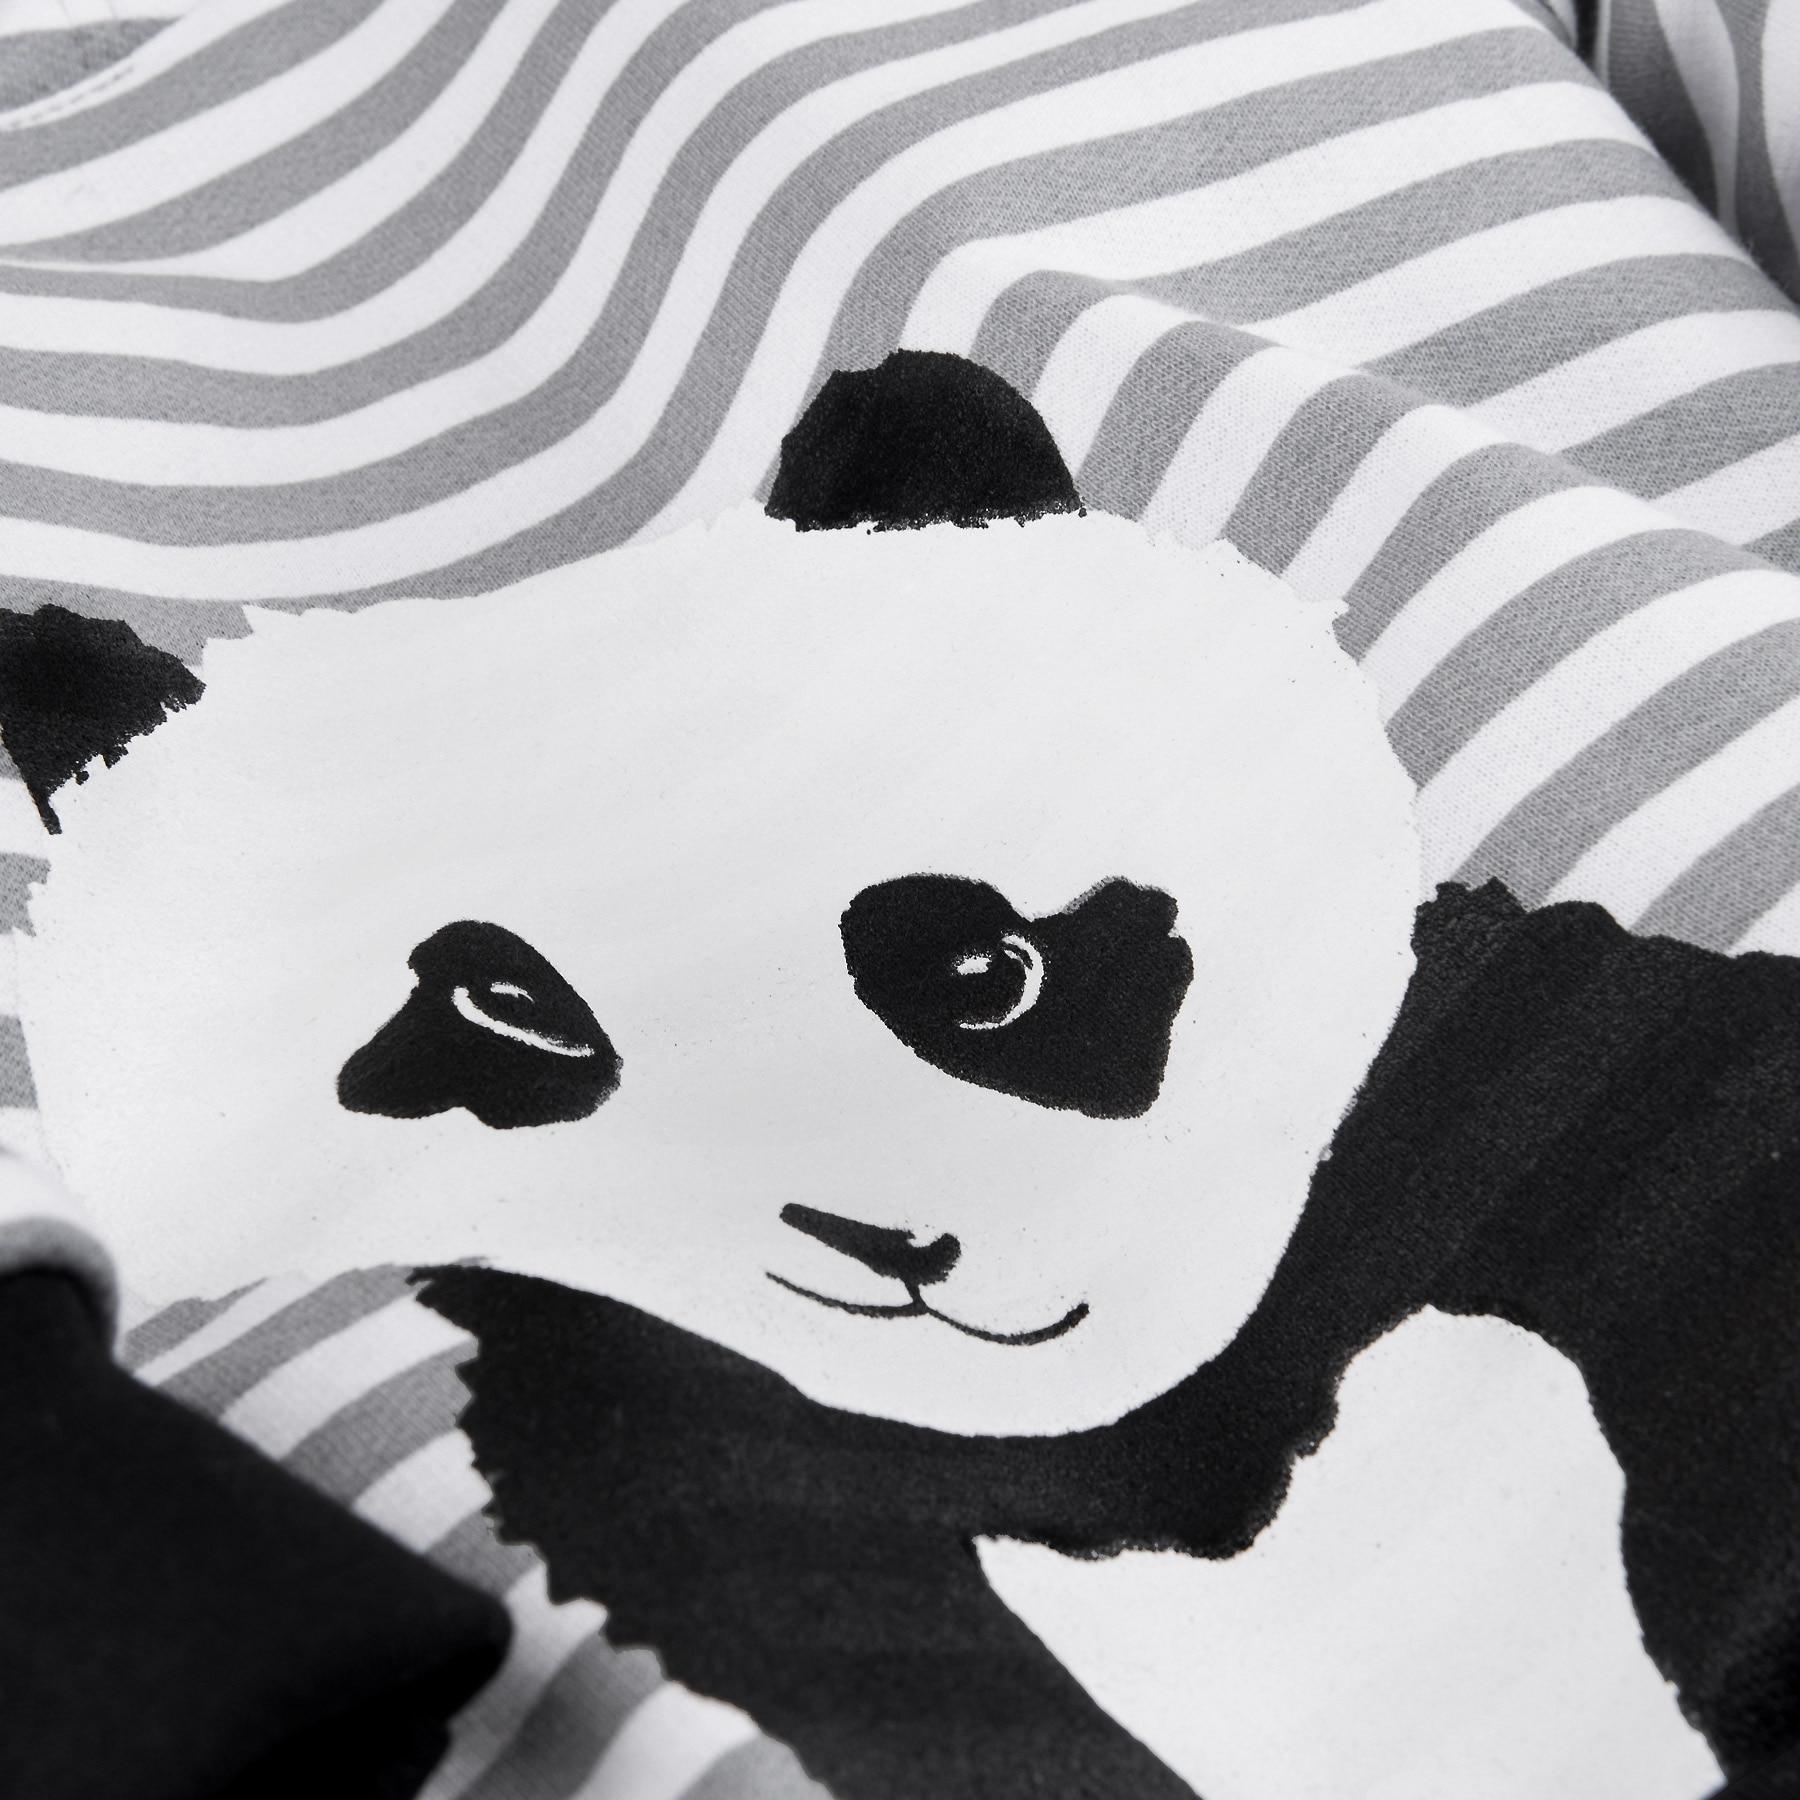 Available from 10.11 BOSSA NOVA Baby Hoodies Sweatshirts Panda 193B-472 panda head knit baby booties